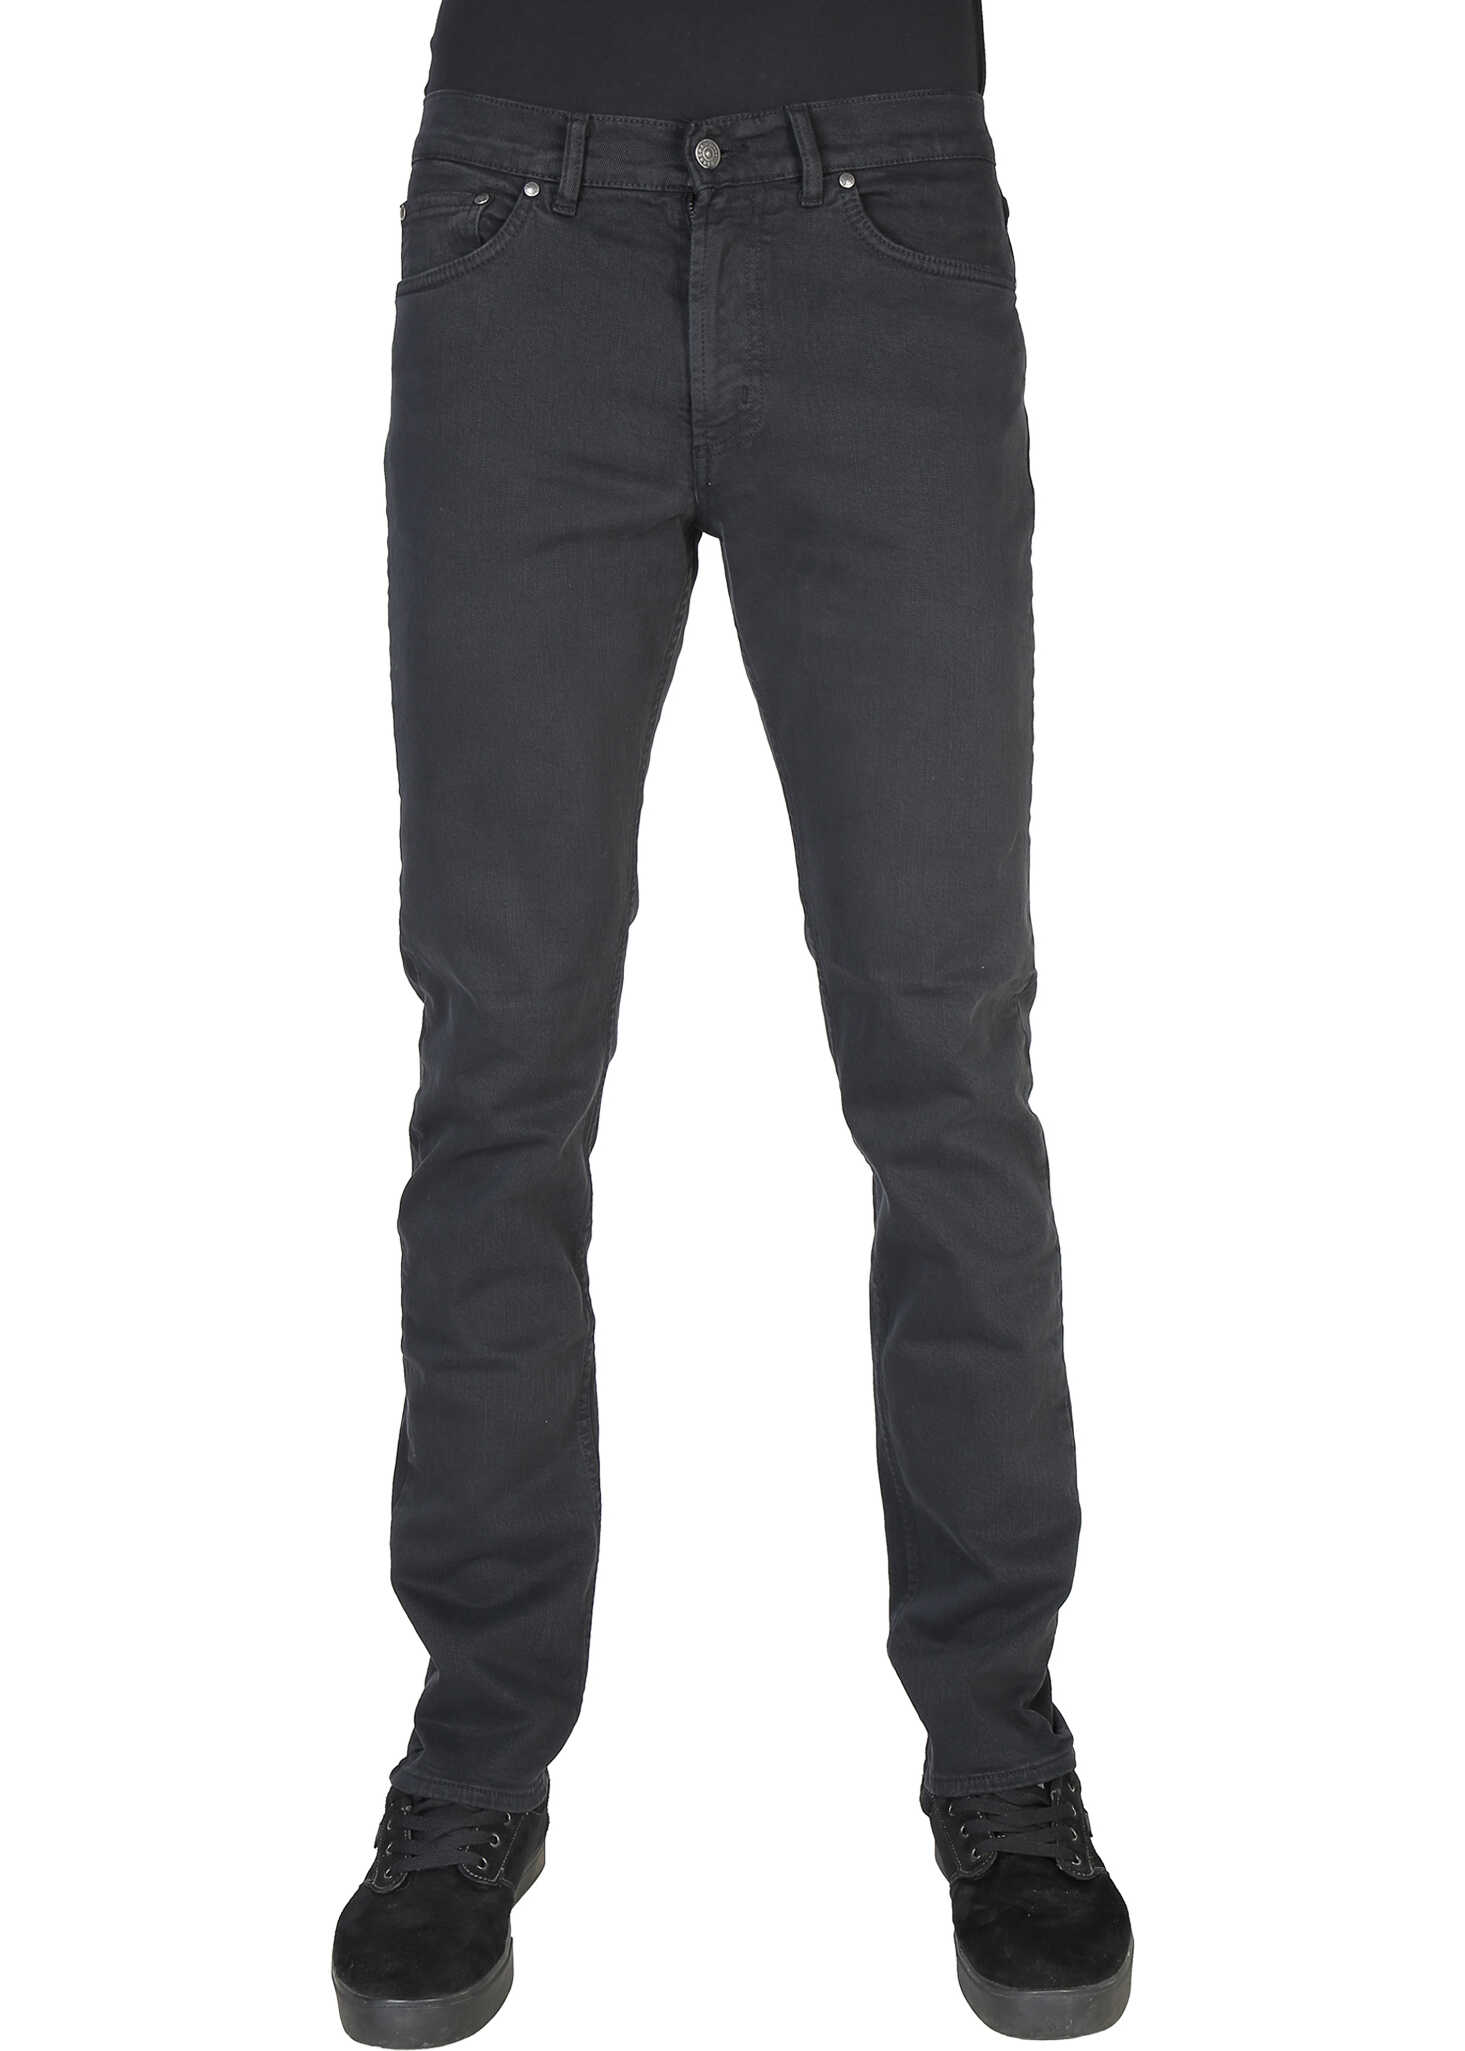 Carrera Jeans 000700_9302A Black